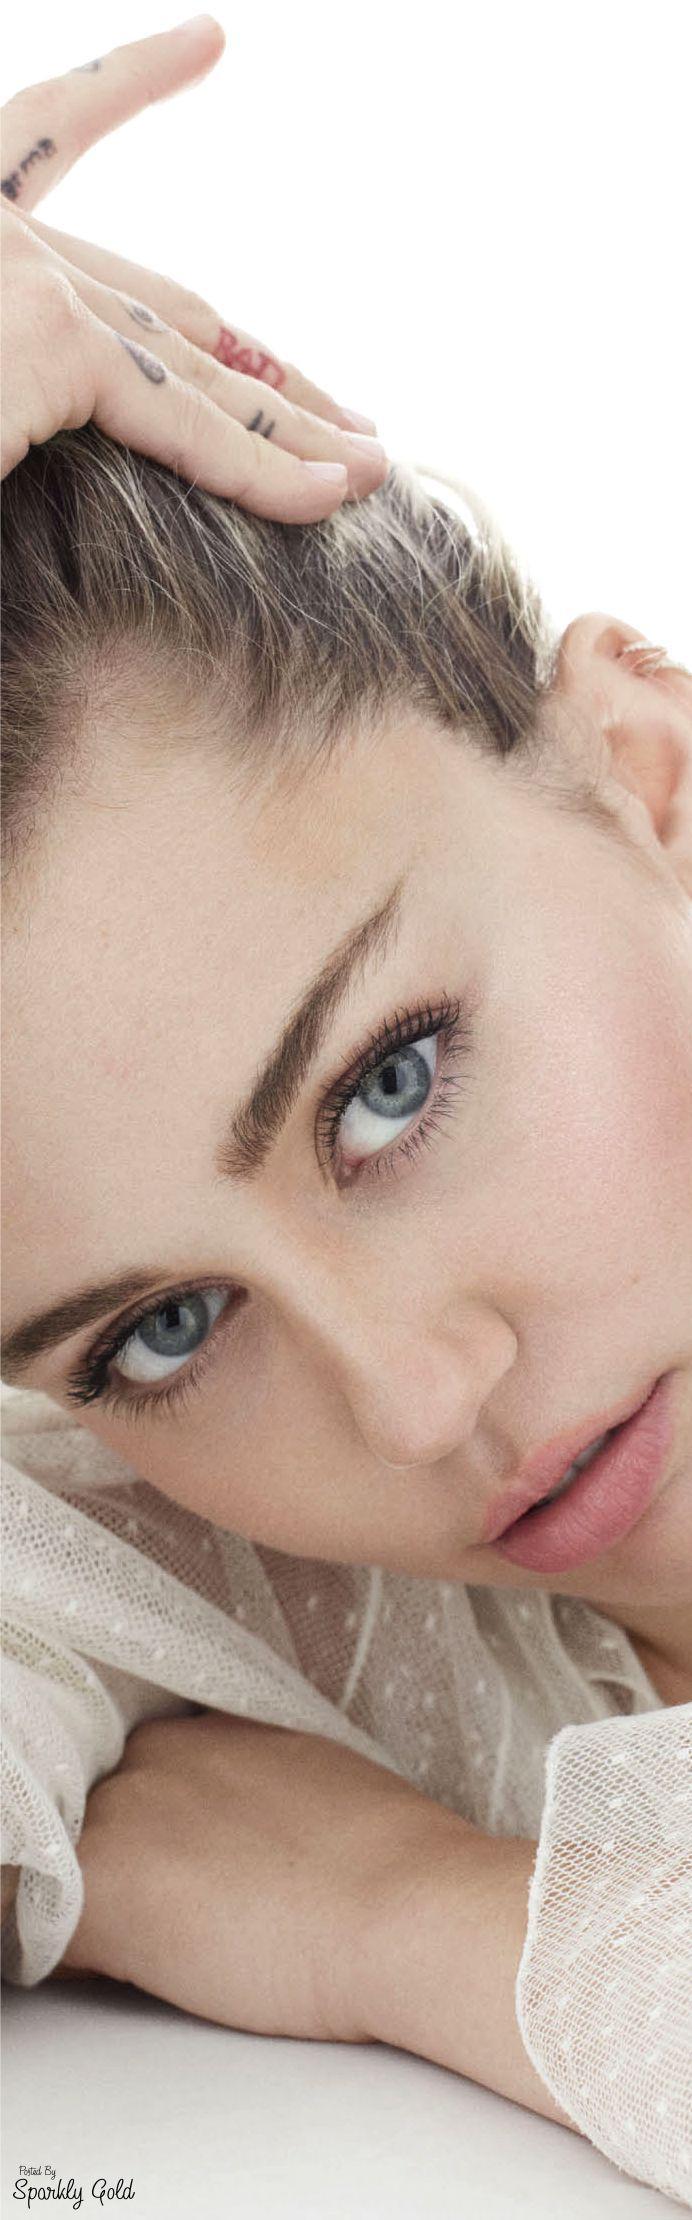 Miley Cyrus Elle Oct 16